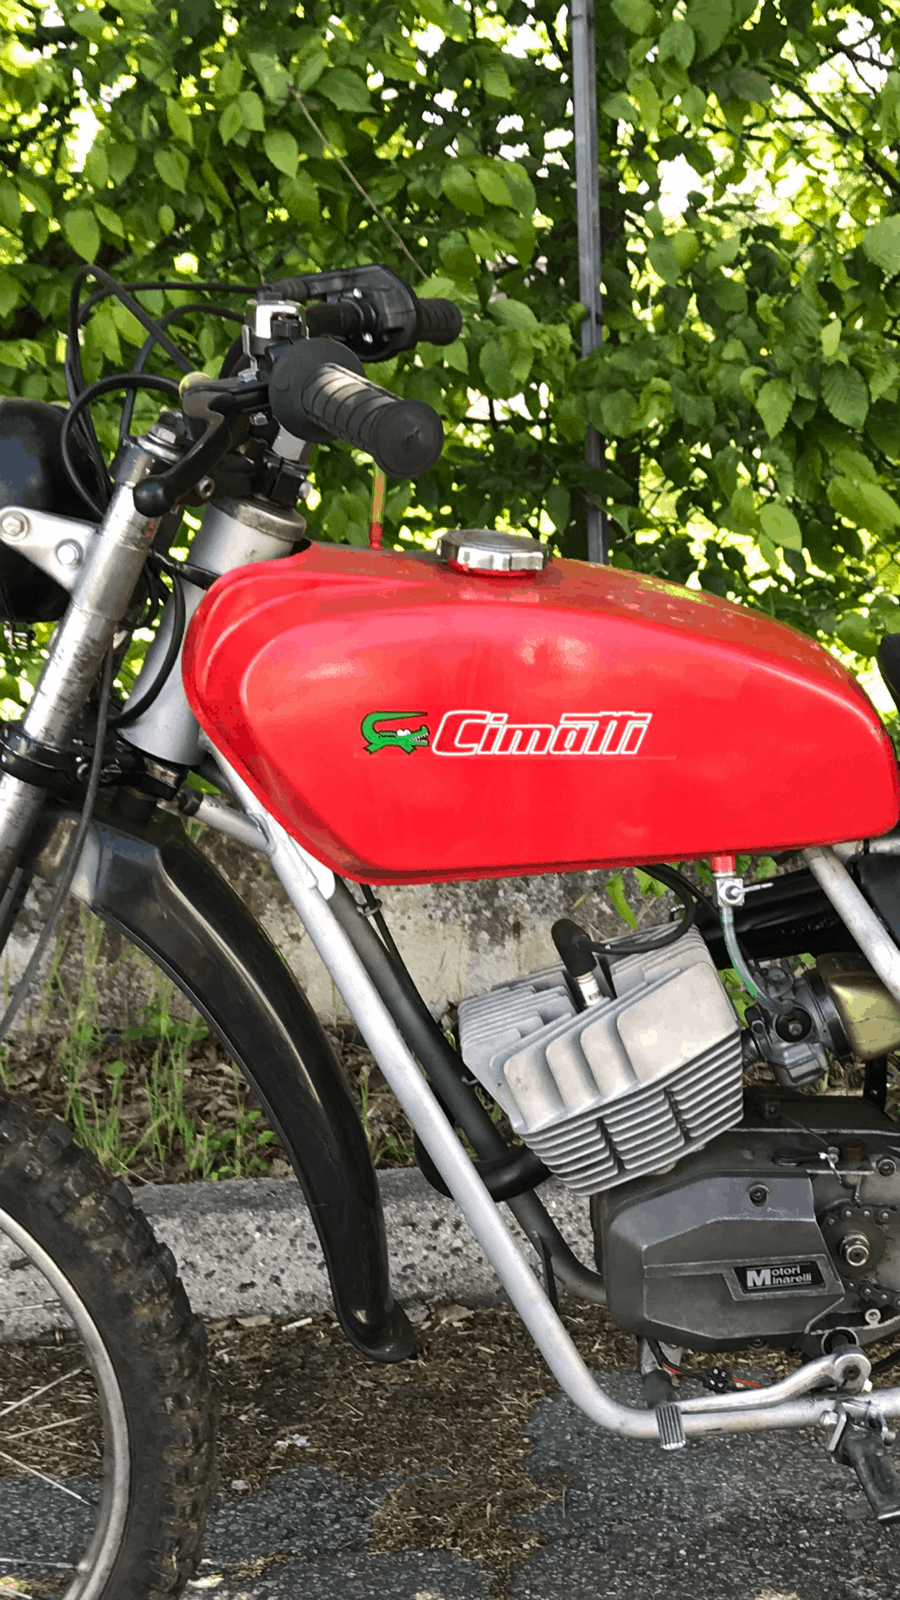 CIMATTI KAIMAN 4M 50cc CROSS 1974